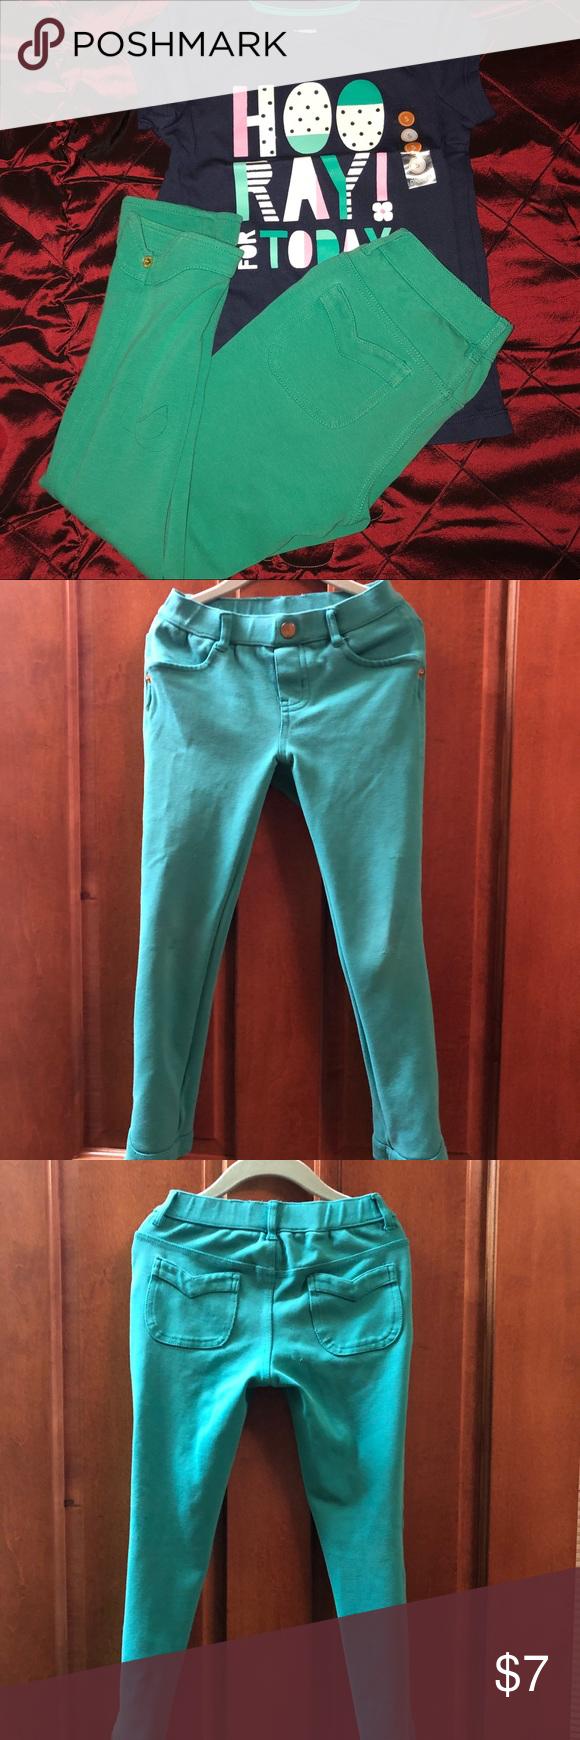 Gymboree Girls pants Green Gymboree pants Gymboree Bottoms Casual